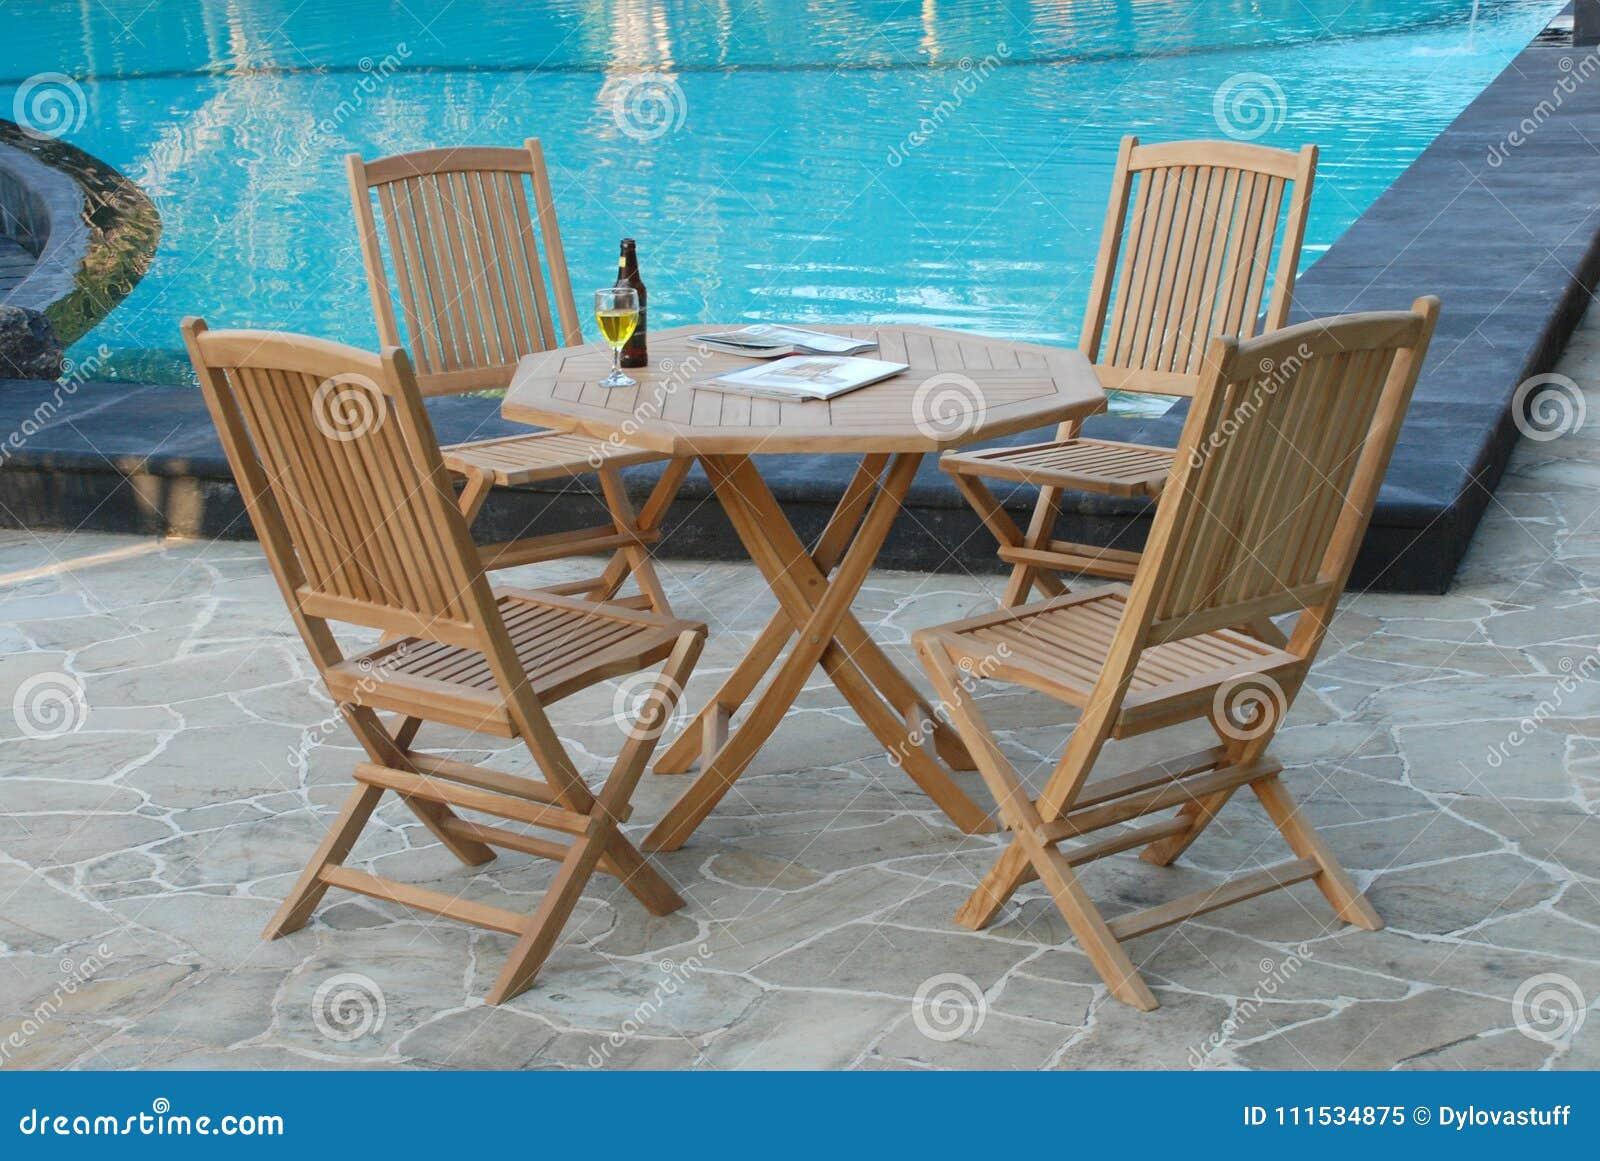 Swell Teak Garden Furniture Out Door Teak Garden Stock Image Machost Co Dining Chair Design Ideas Machostcouk